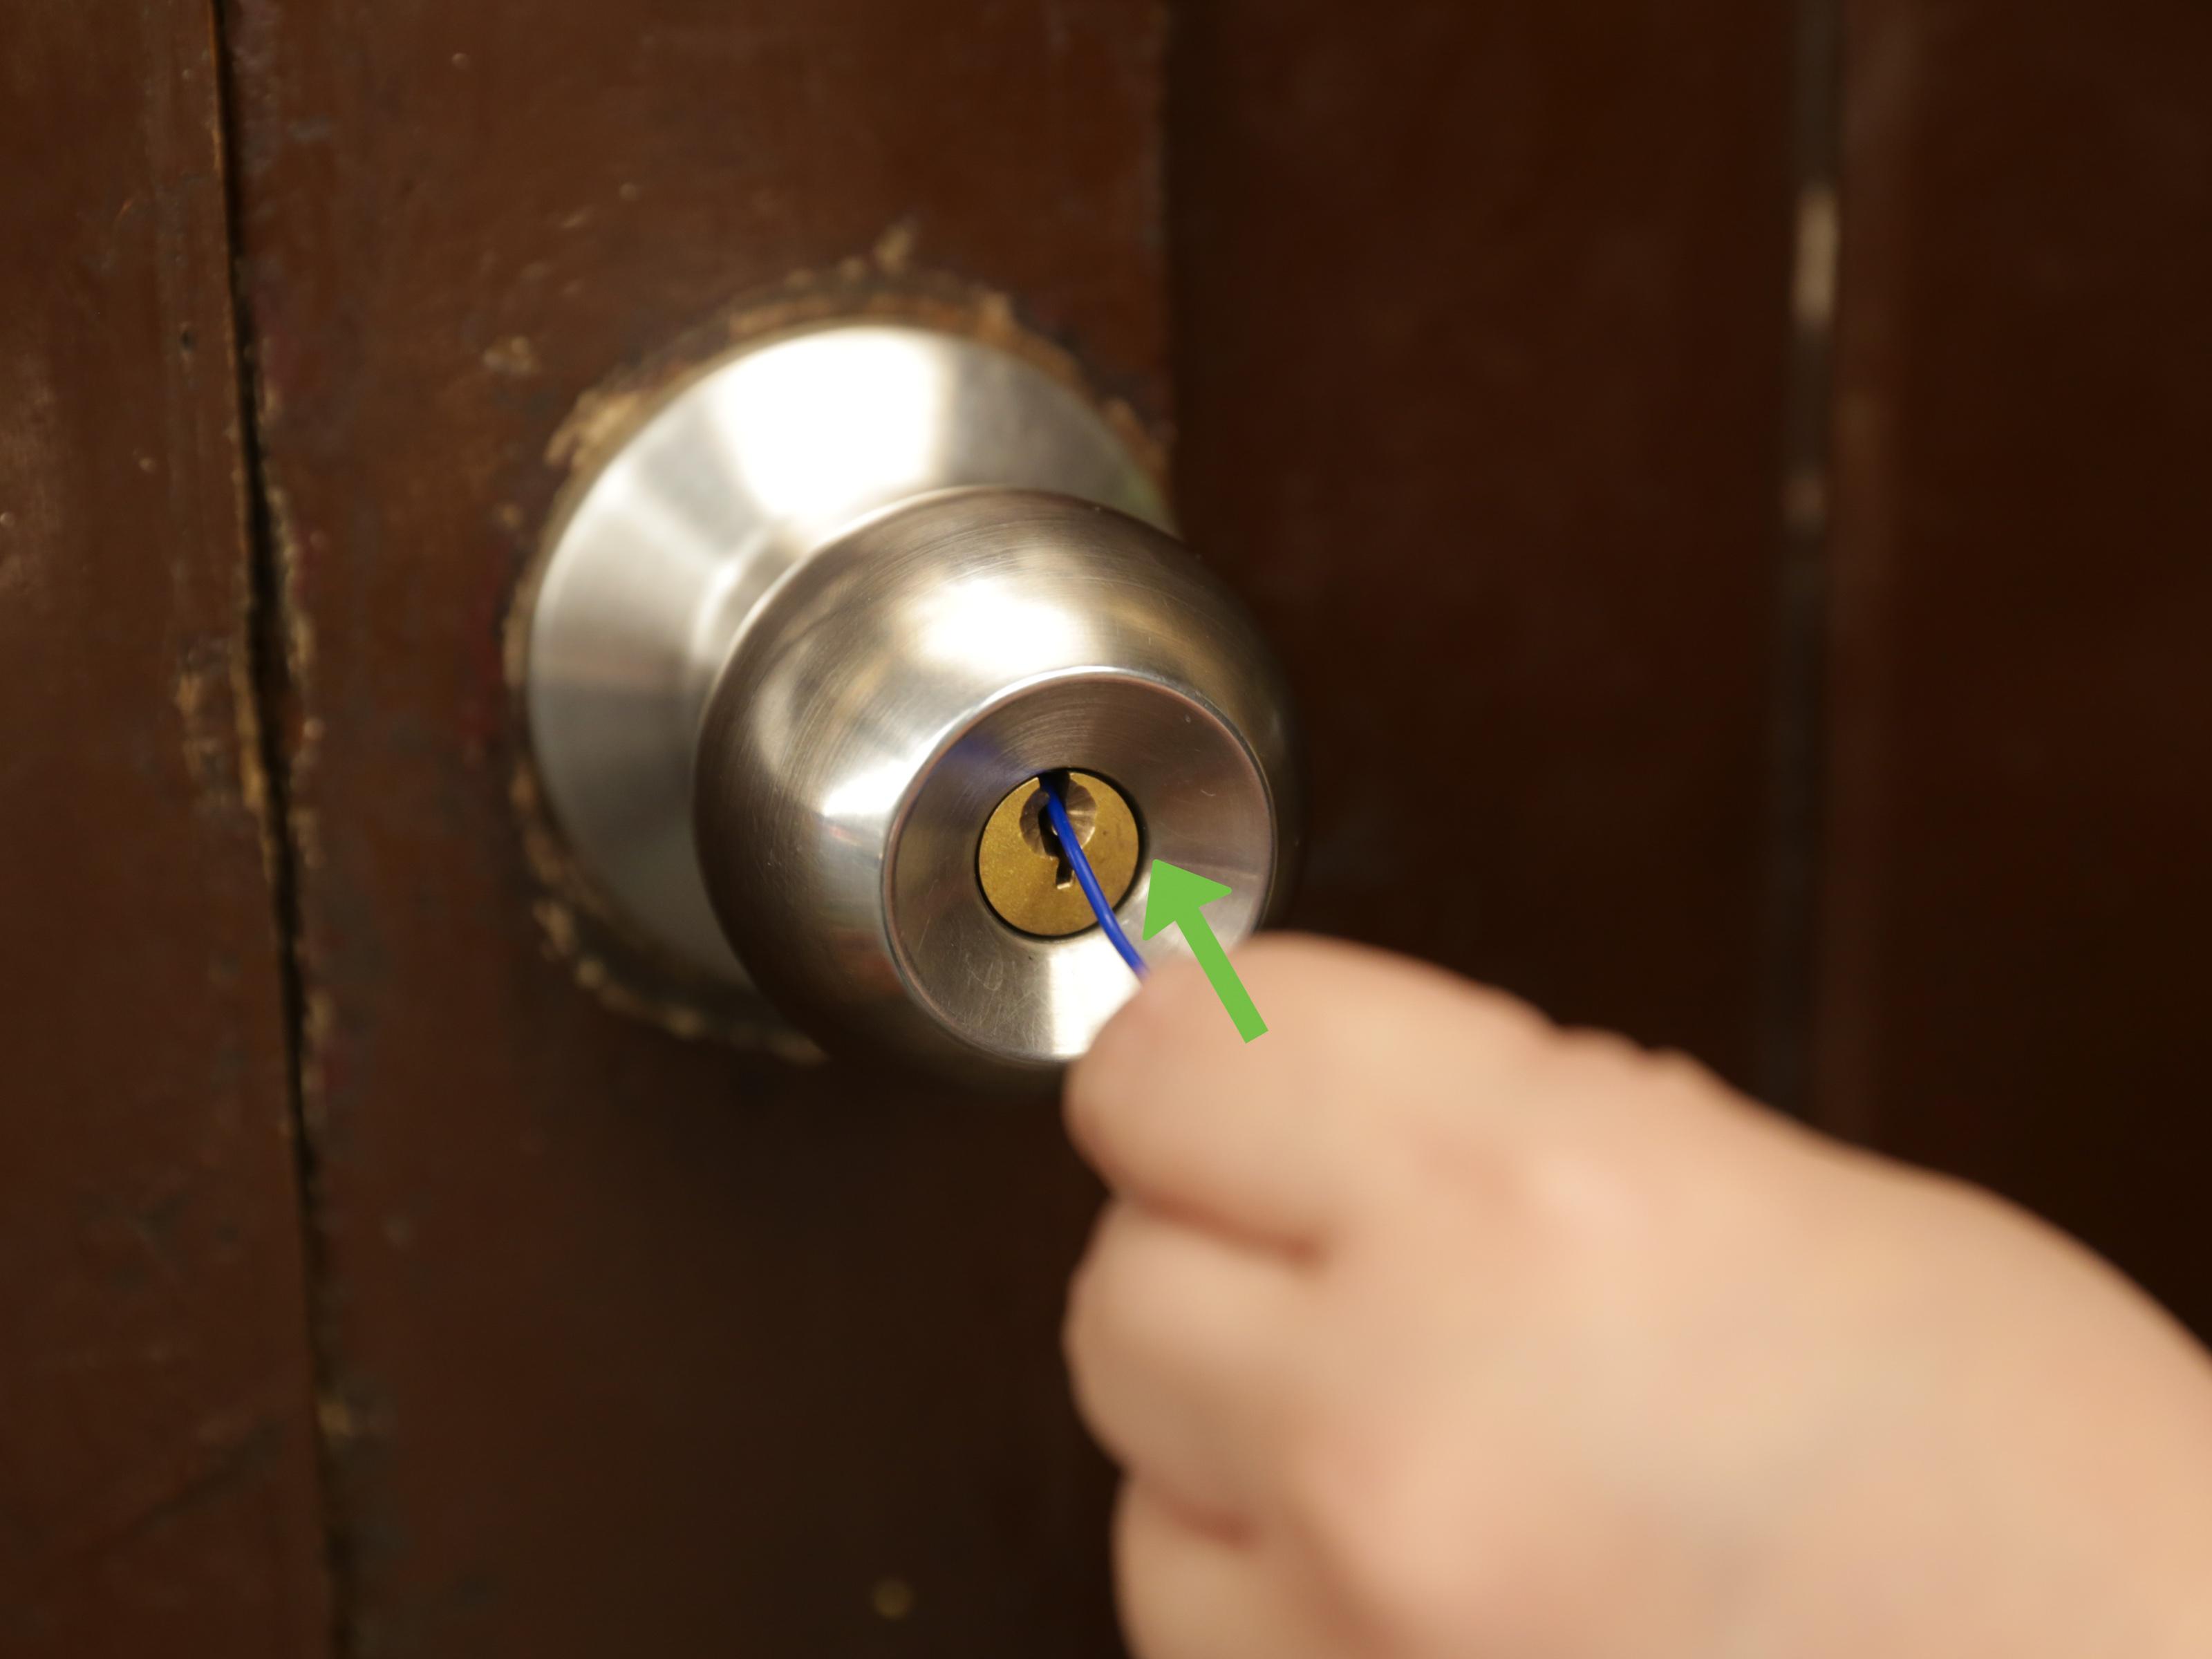 picking a door knob lock photo - 7